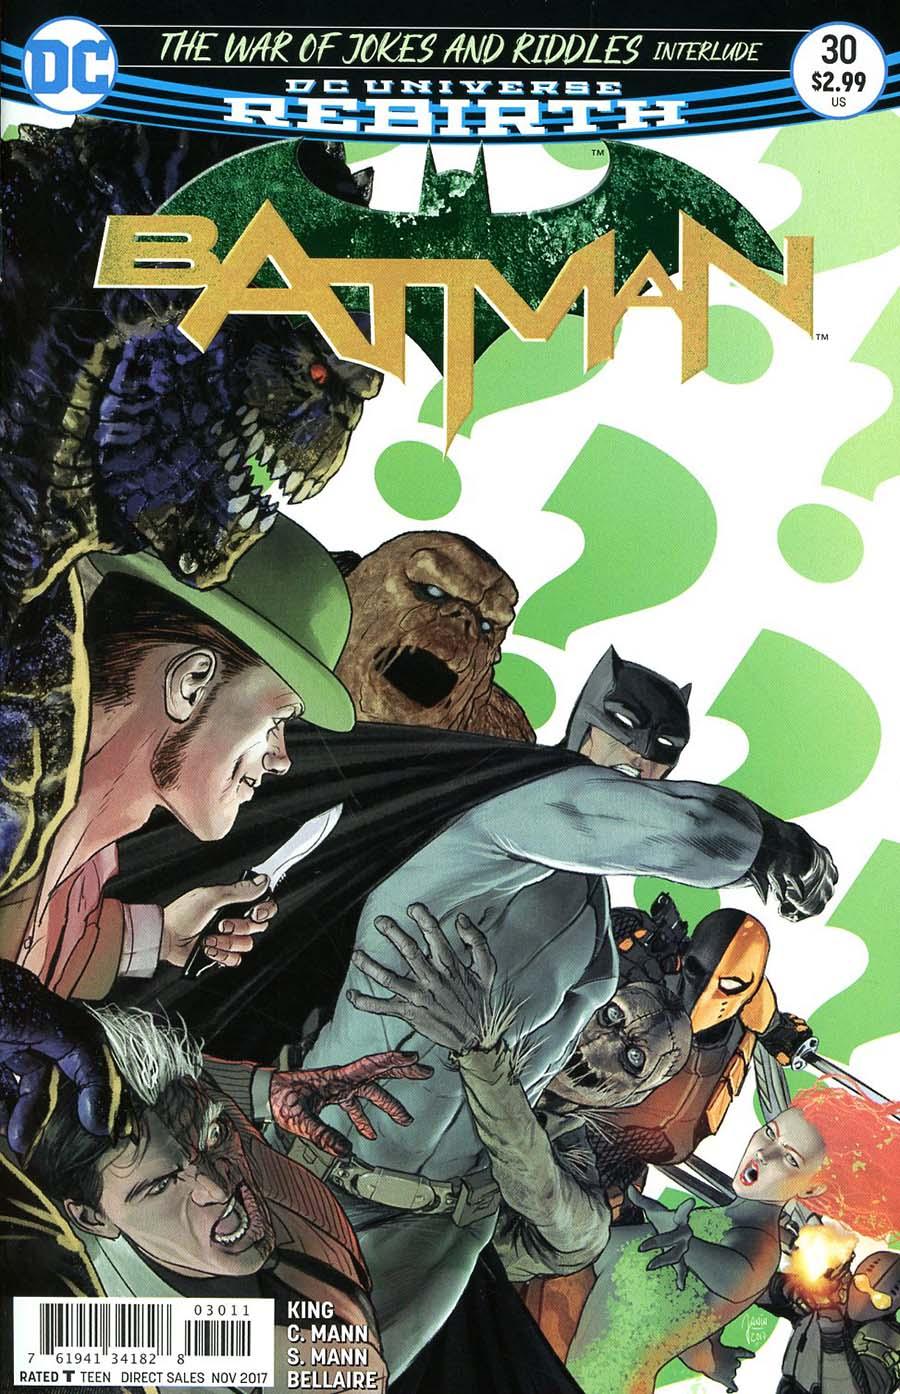 Batman 30 - The War of Jokes & Riddles Interlude: The Ballad of Kite Man